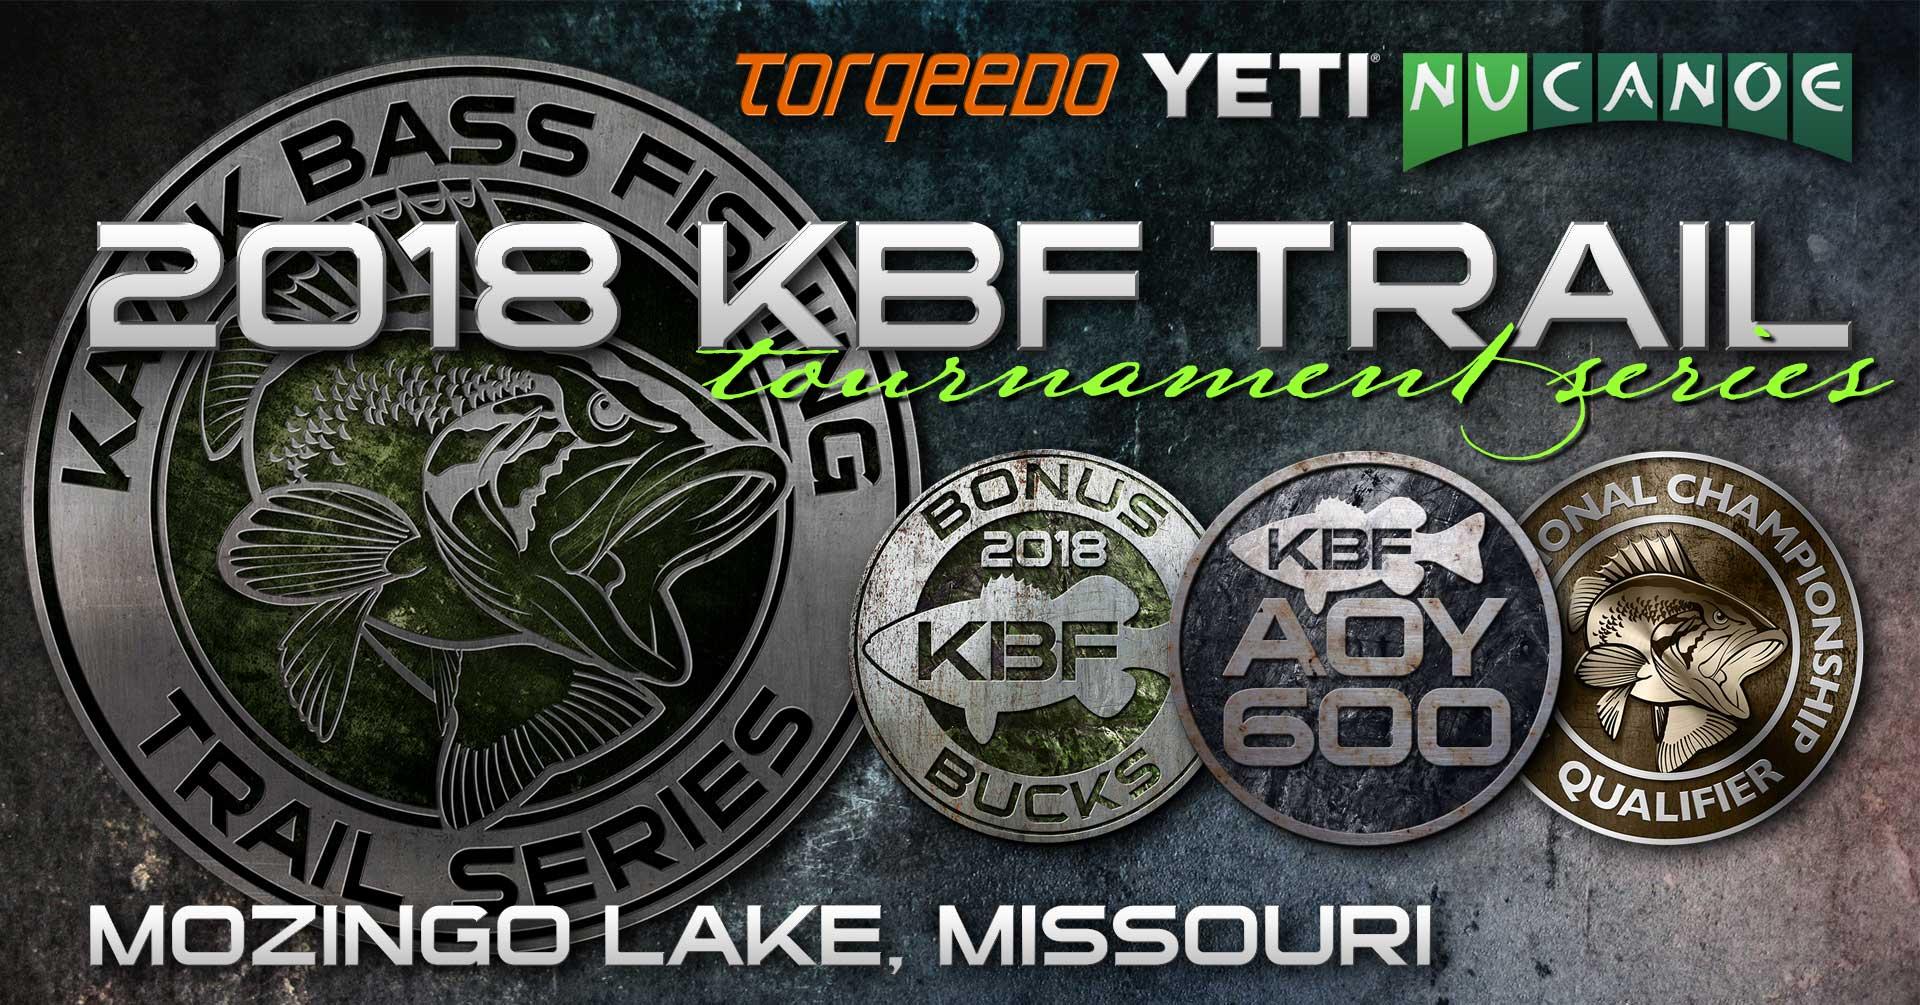 2018 KBF TRAIL 09 Mozingo Lake, MO